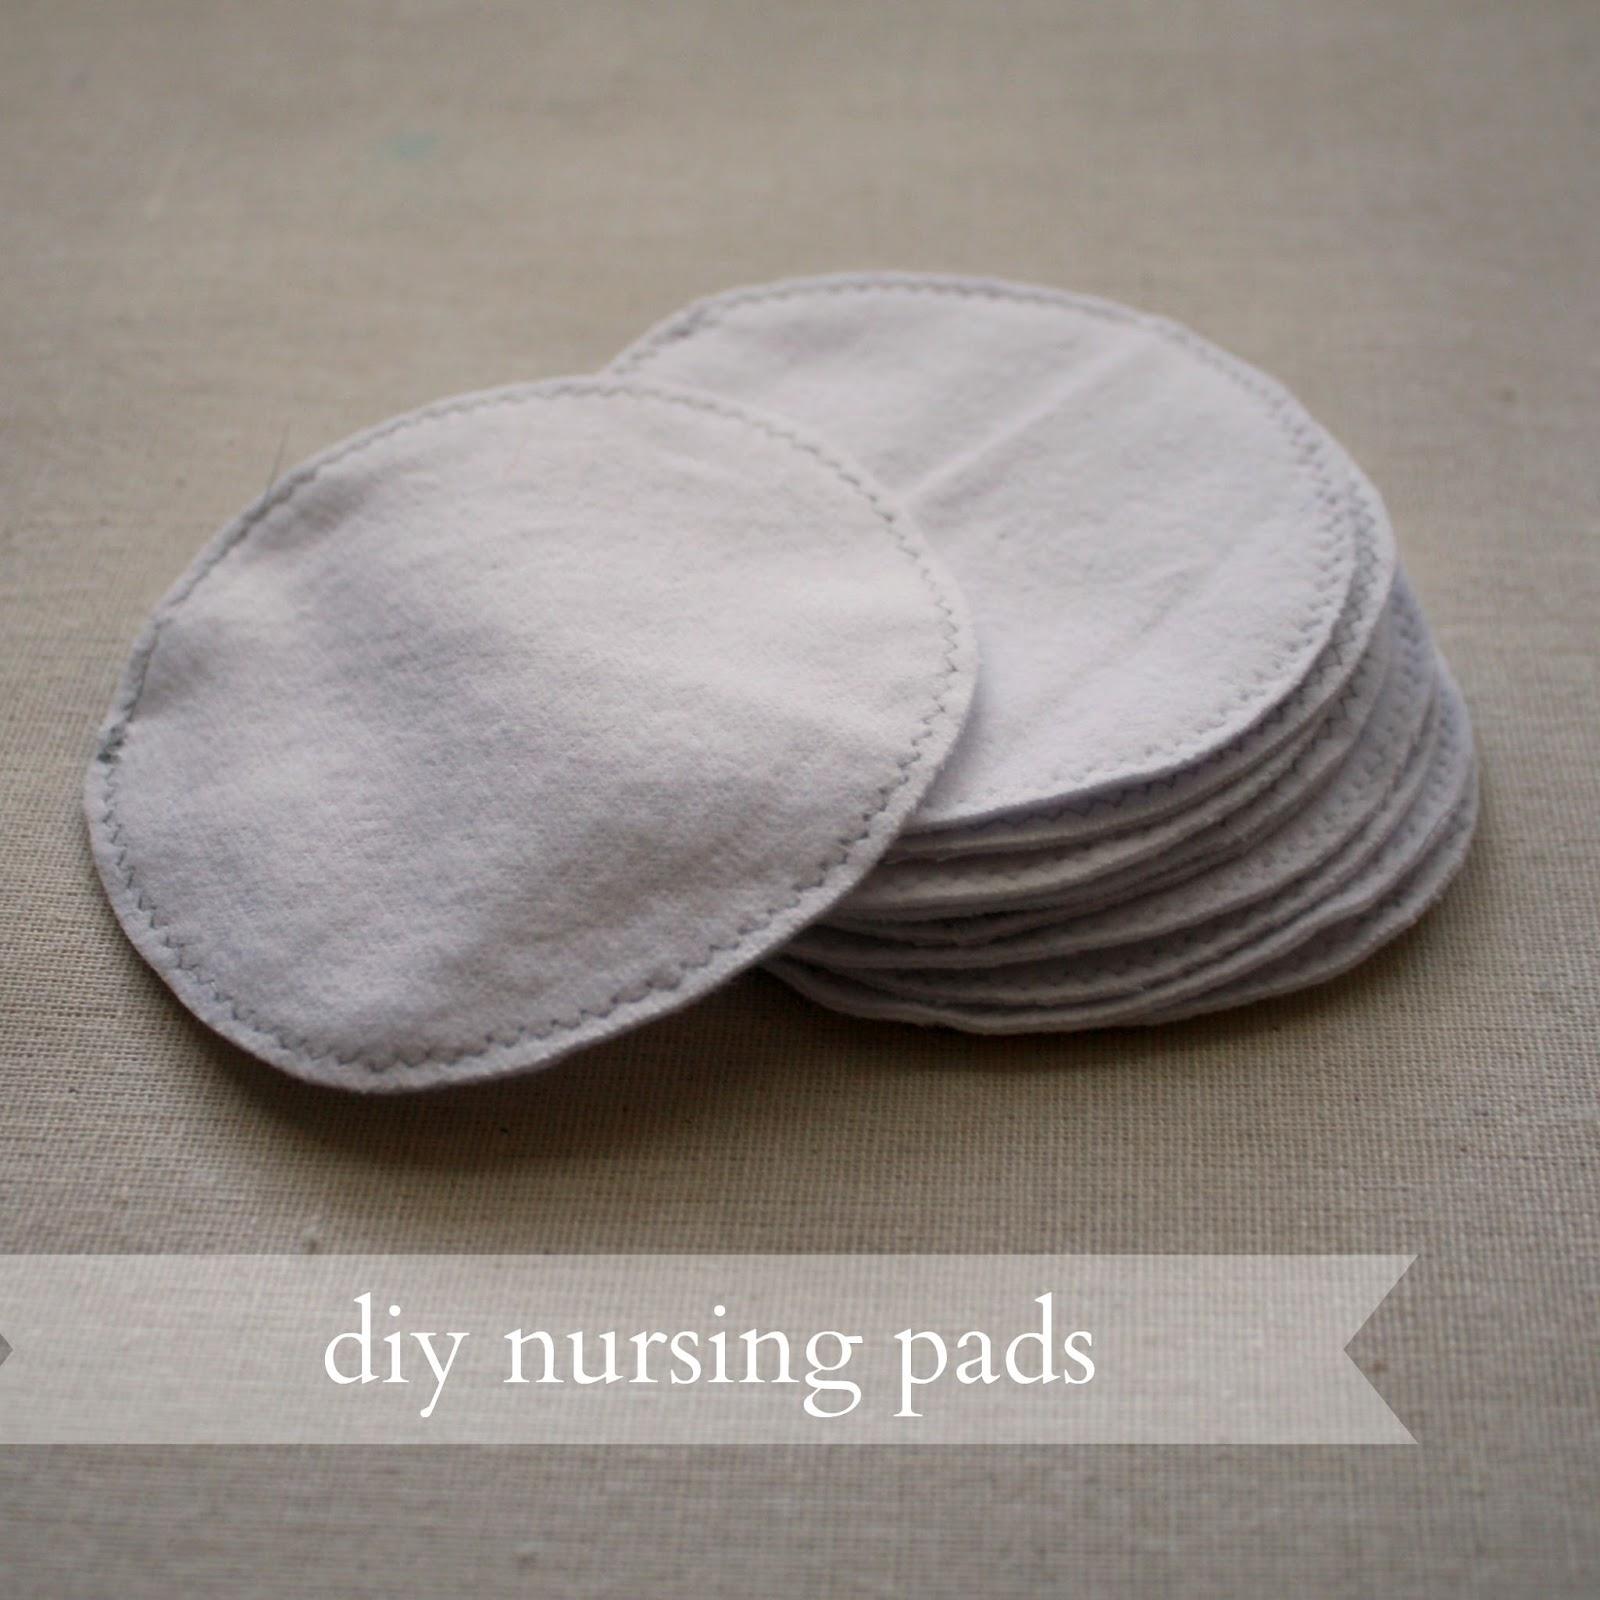 Diy Cloth Pads Tutorial: Live A Little Wilder: Diy Nursing Pads {tutorial}